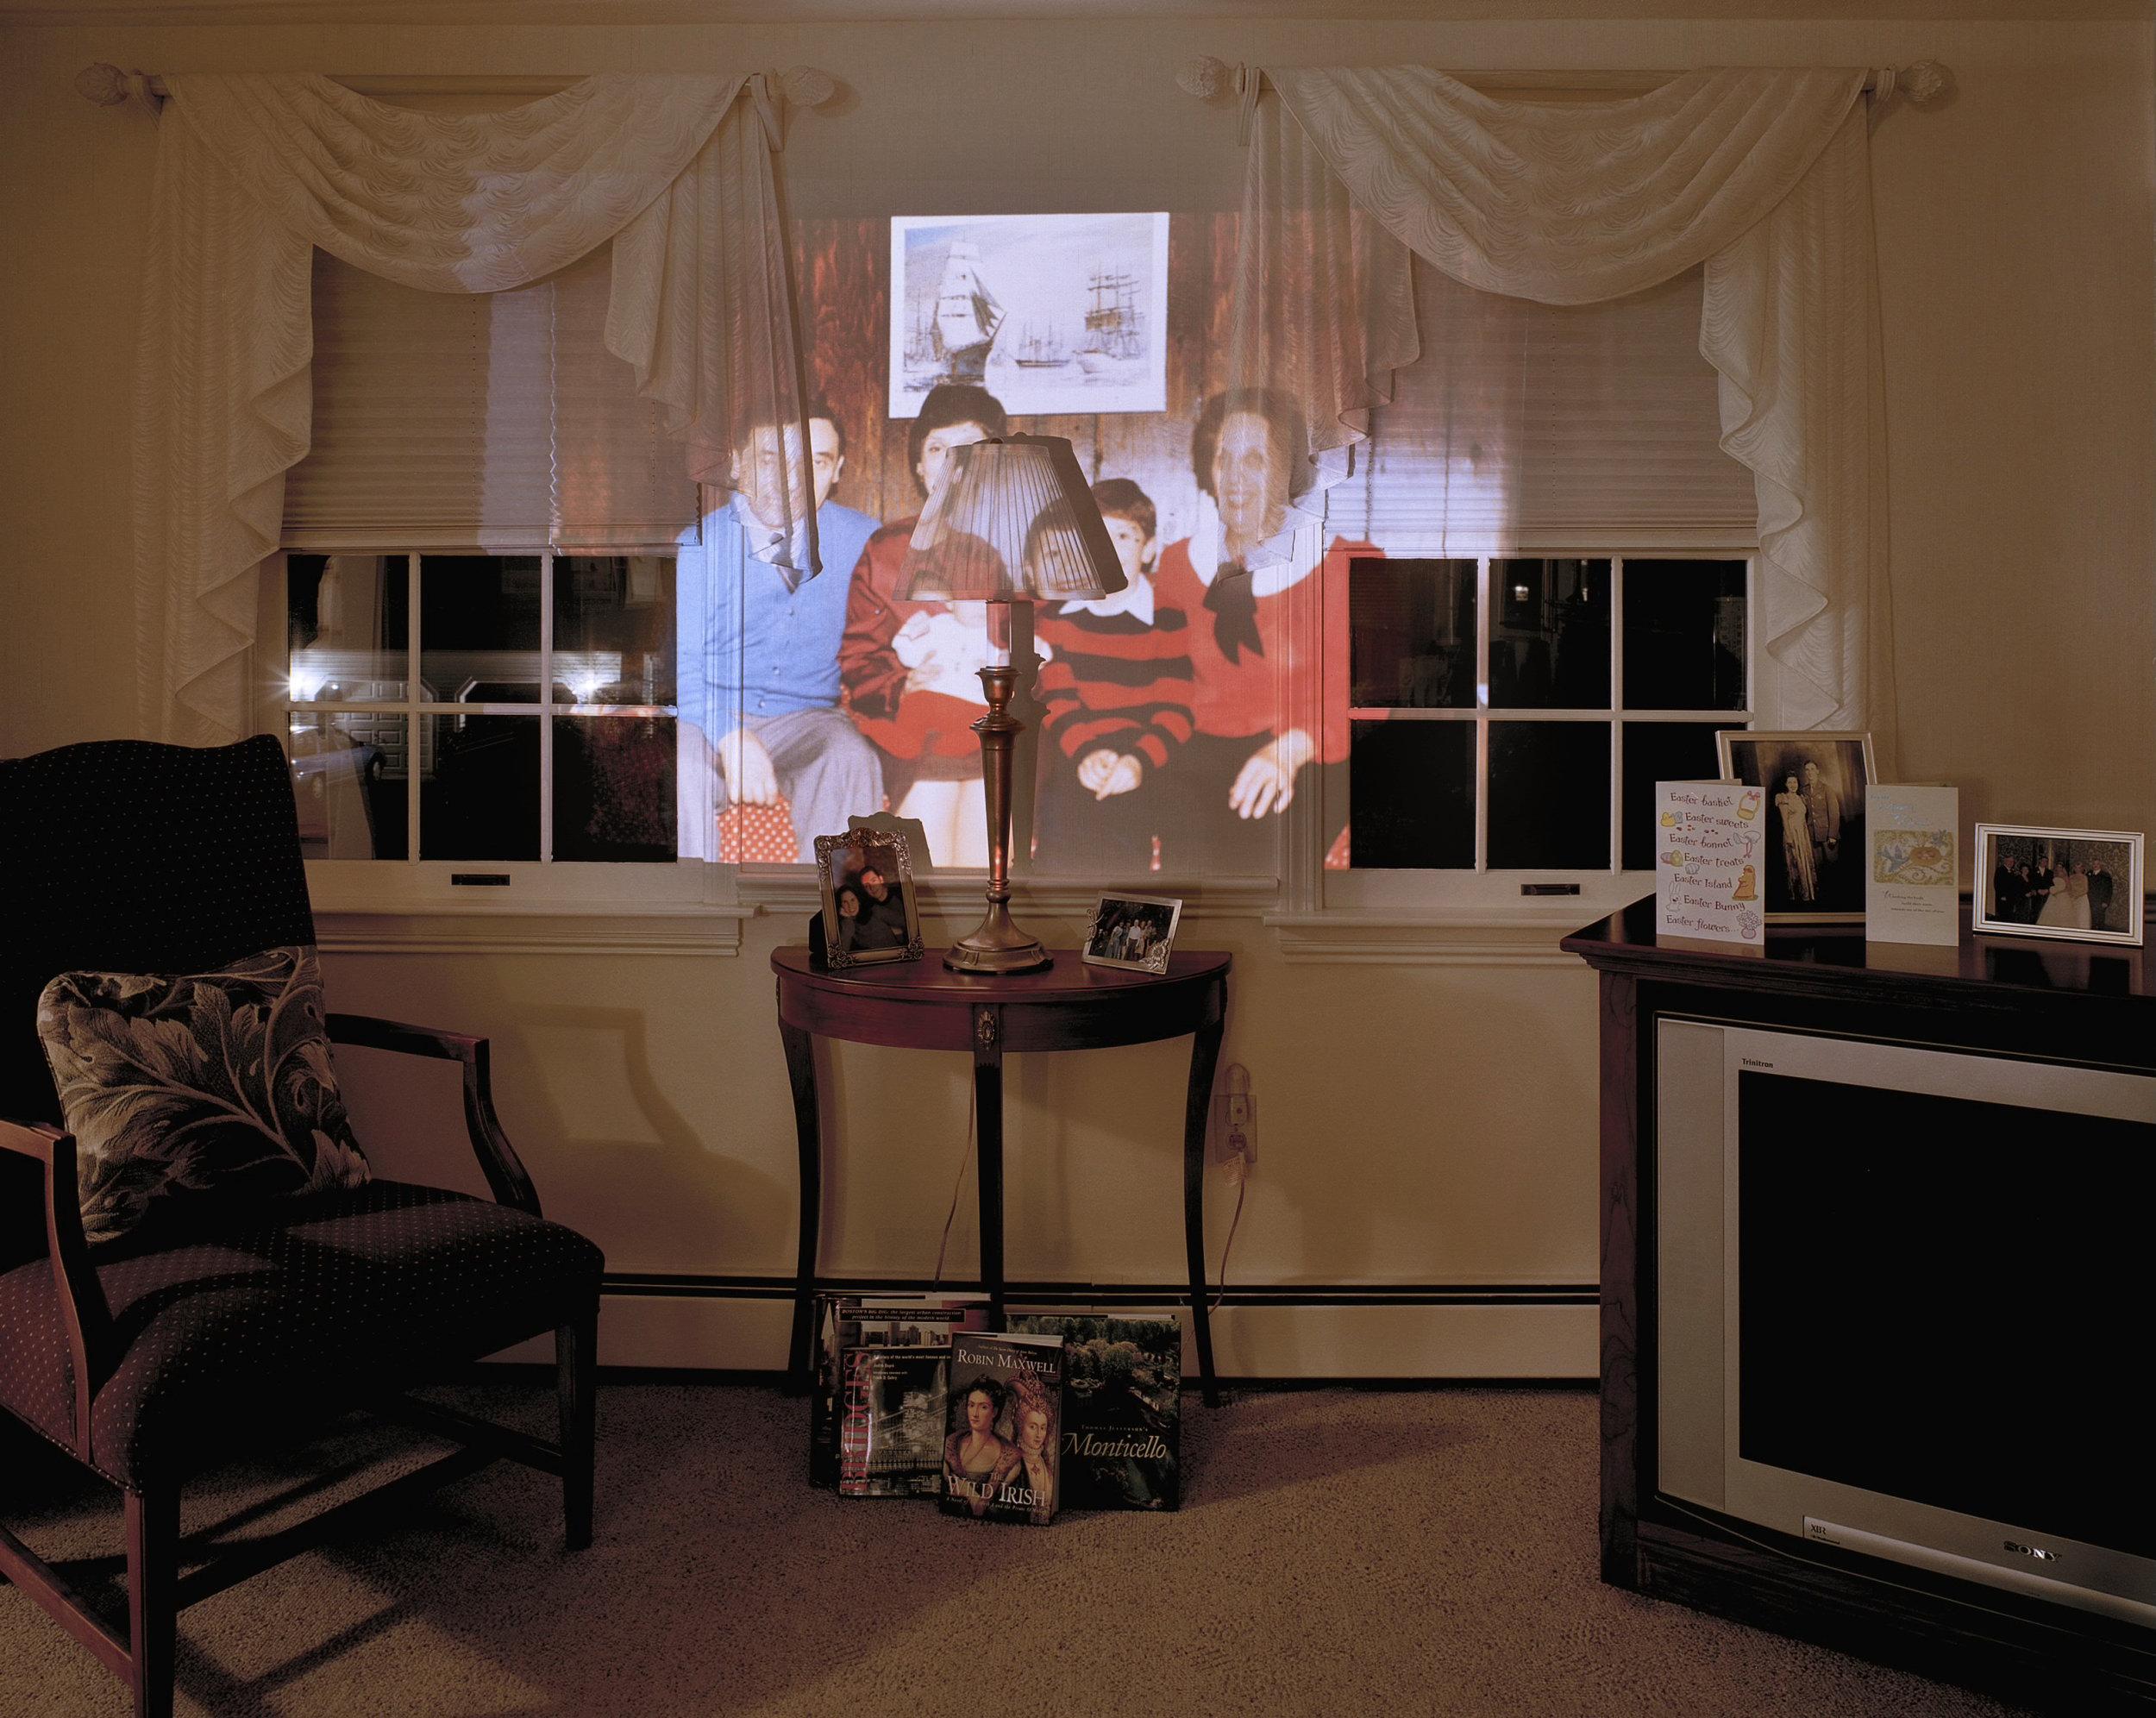 Family Room, 2004